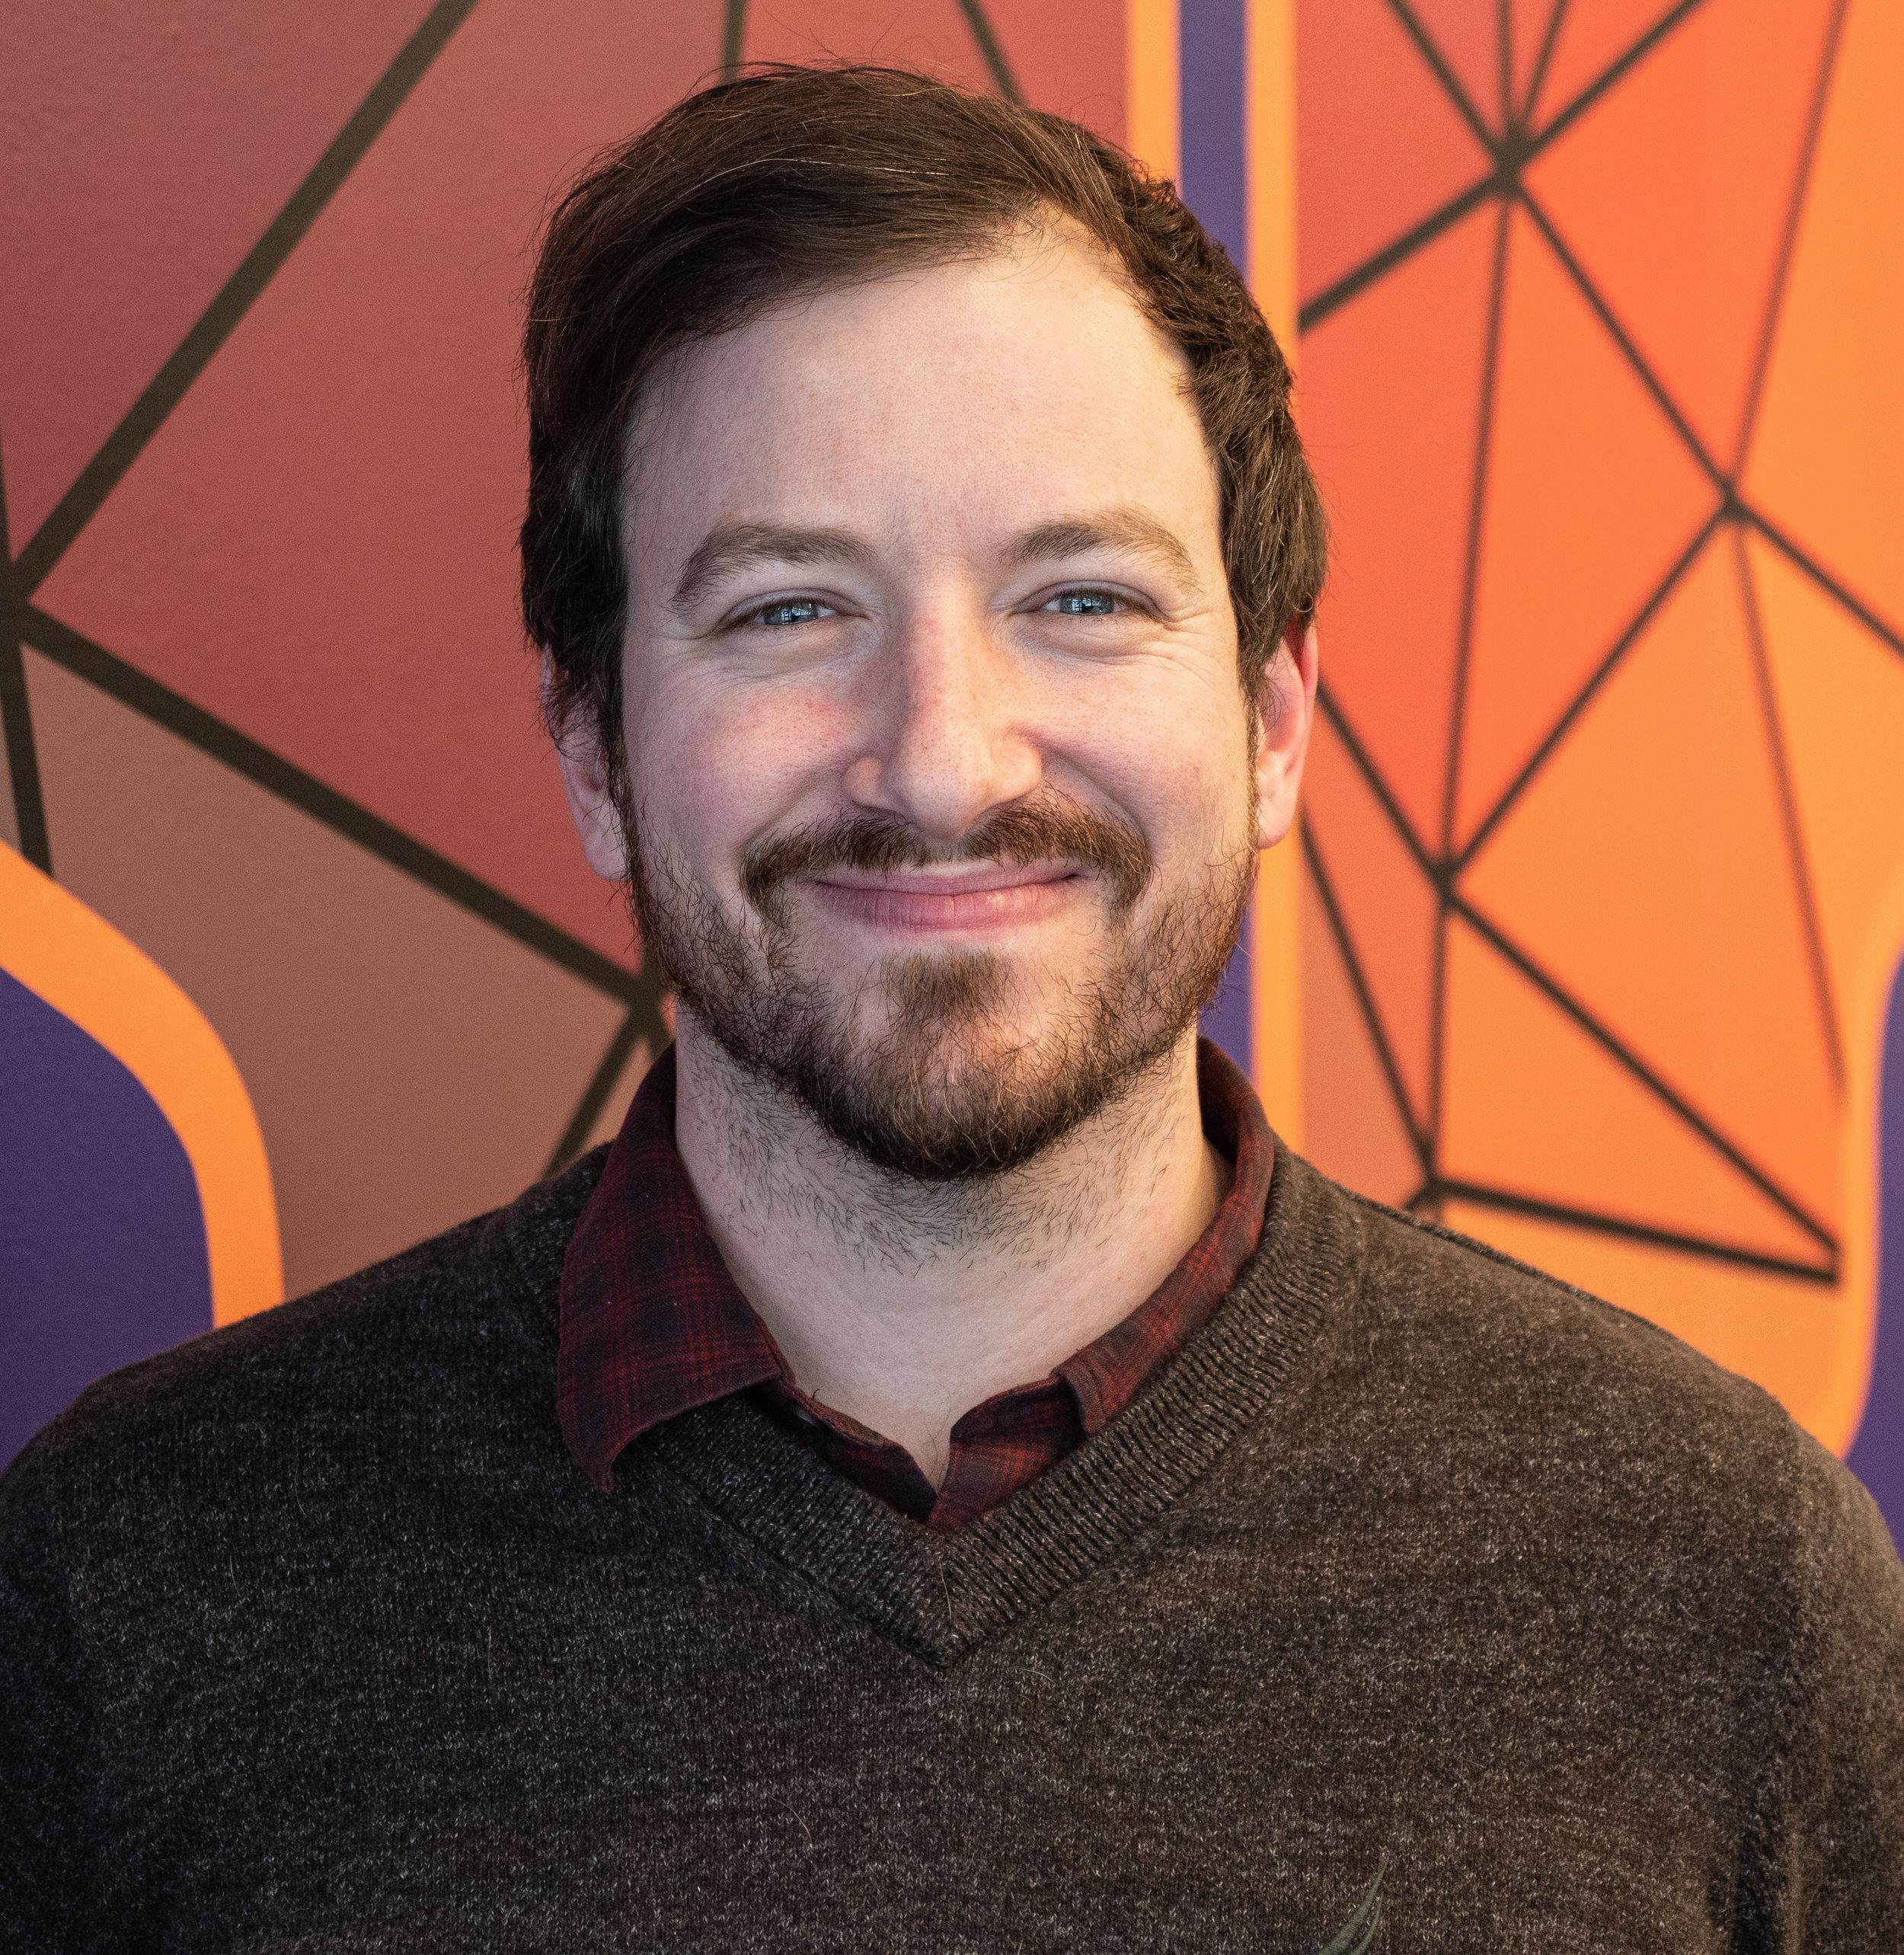 Derek Alan Rowe  VR/AR Producer